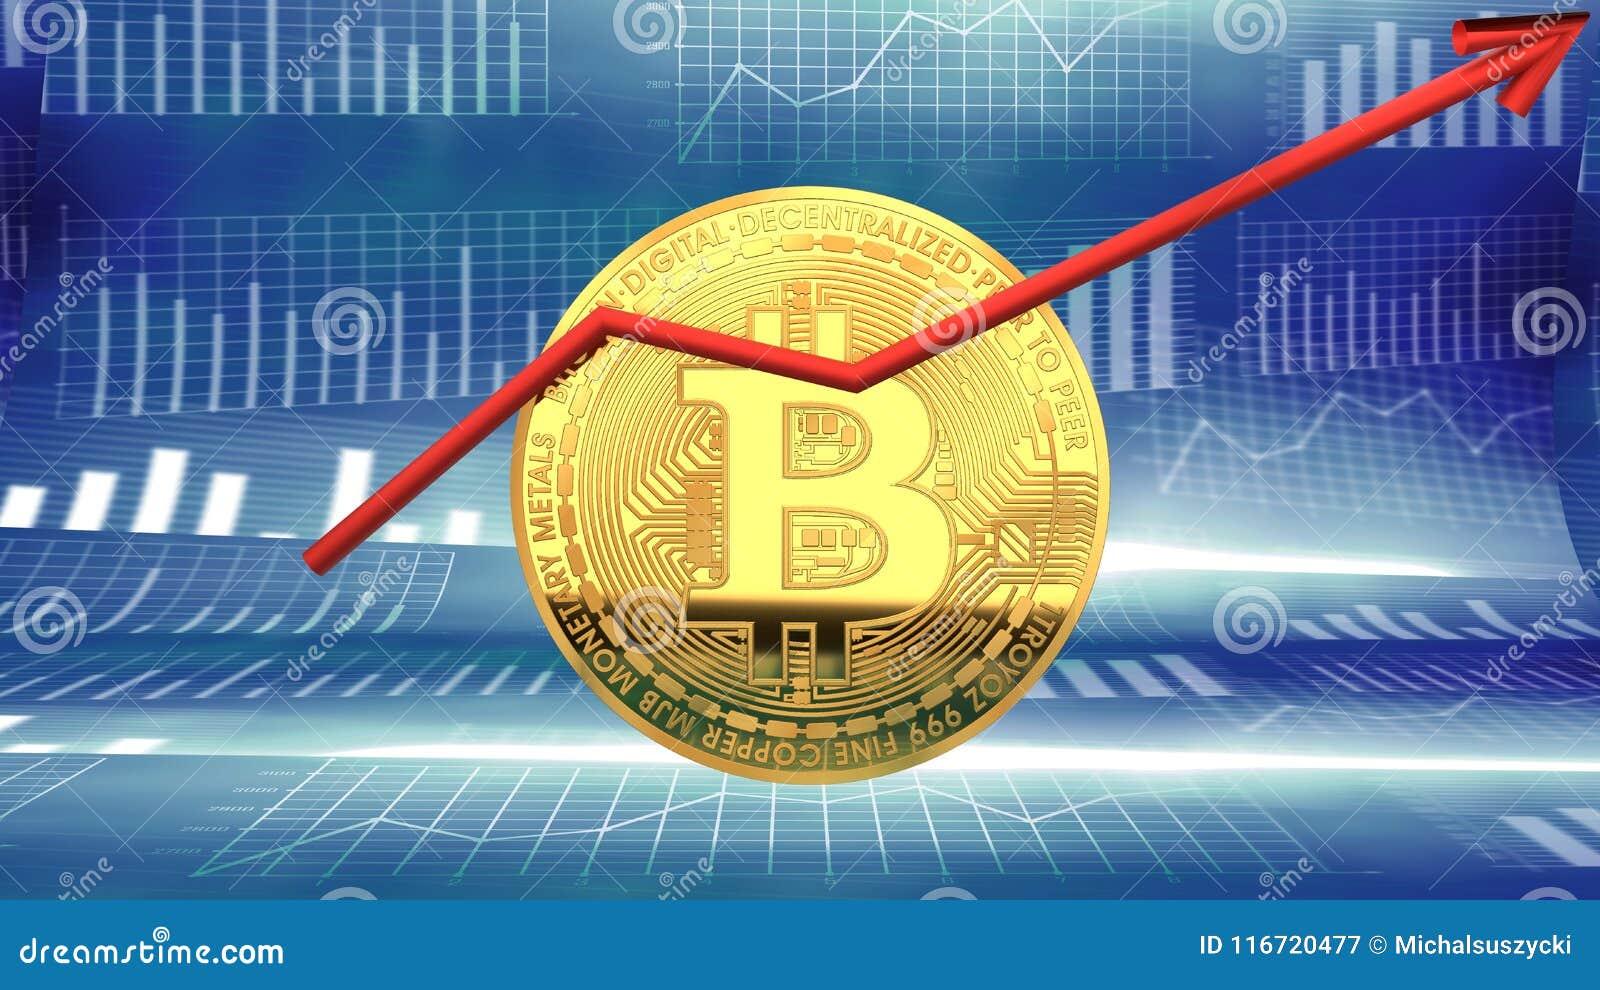 Bitcoin,最近新闻制造商,获取投资者`注意的网络硬币